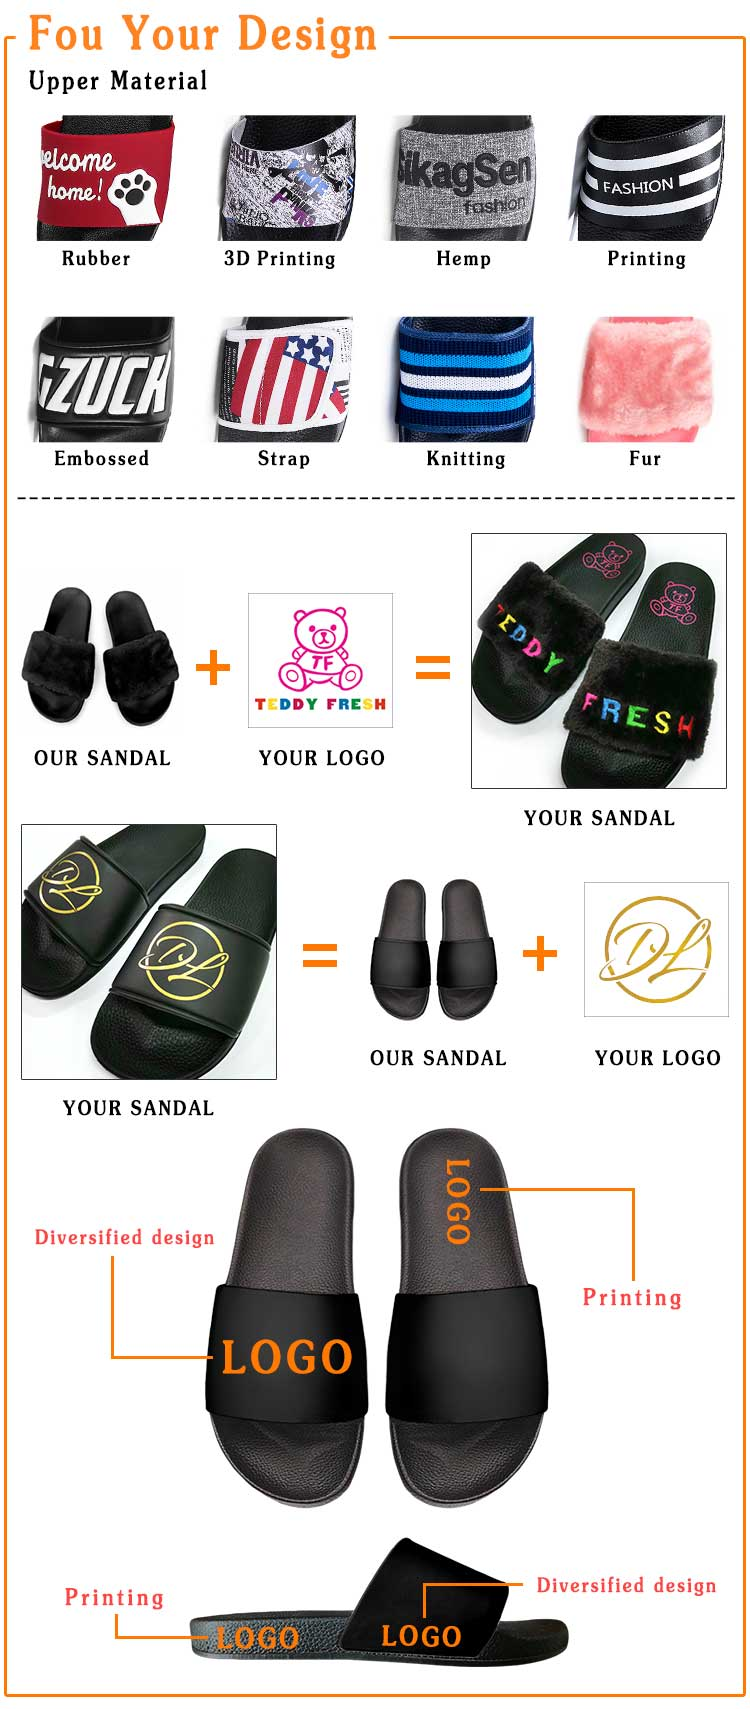 QUFENG Custom Logo 슬라이드 Sandal 도매, 중국어 Unisex 가죽 집 욕실 홈 실 내용 이모티콘 Eva 고무 Slipper 대 한 Men